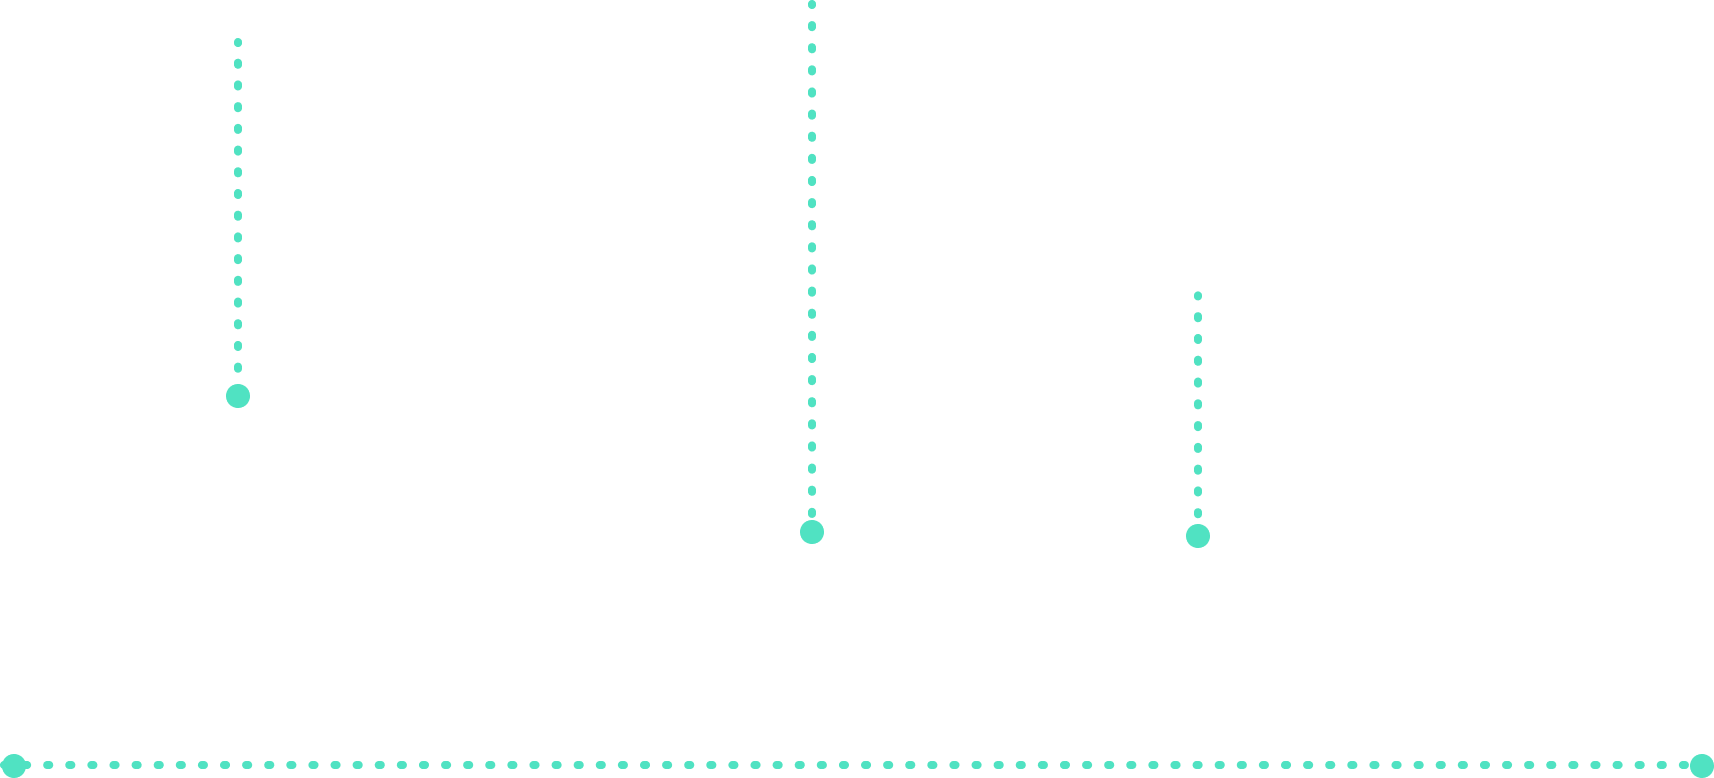 Step 4 - Lines